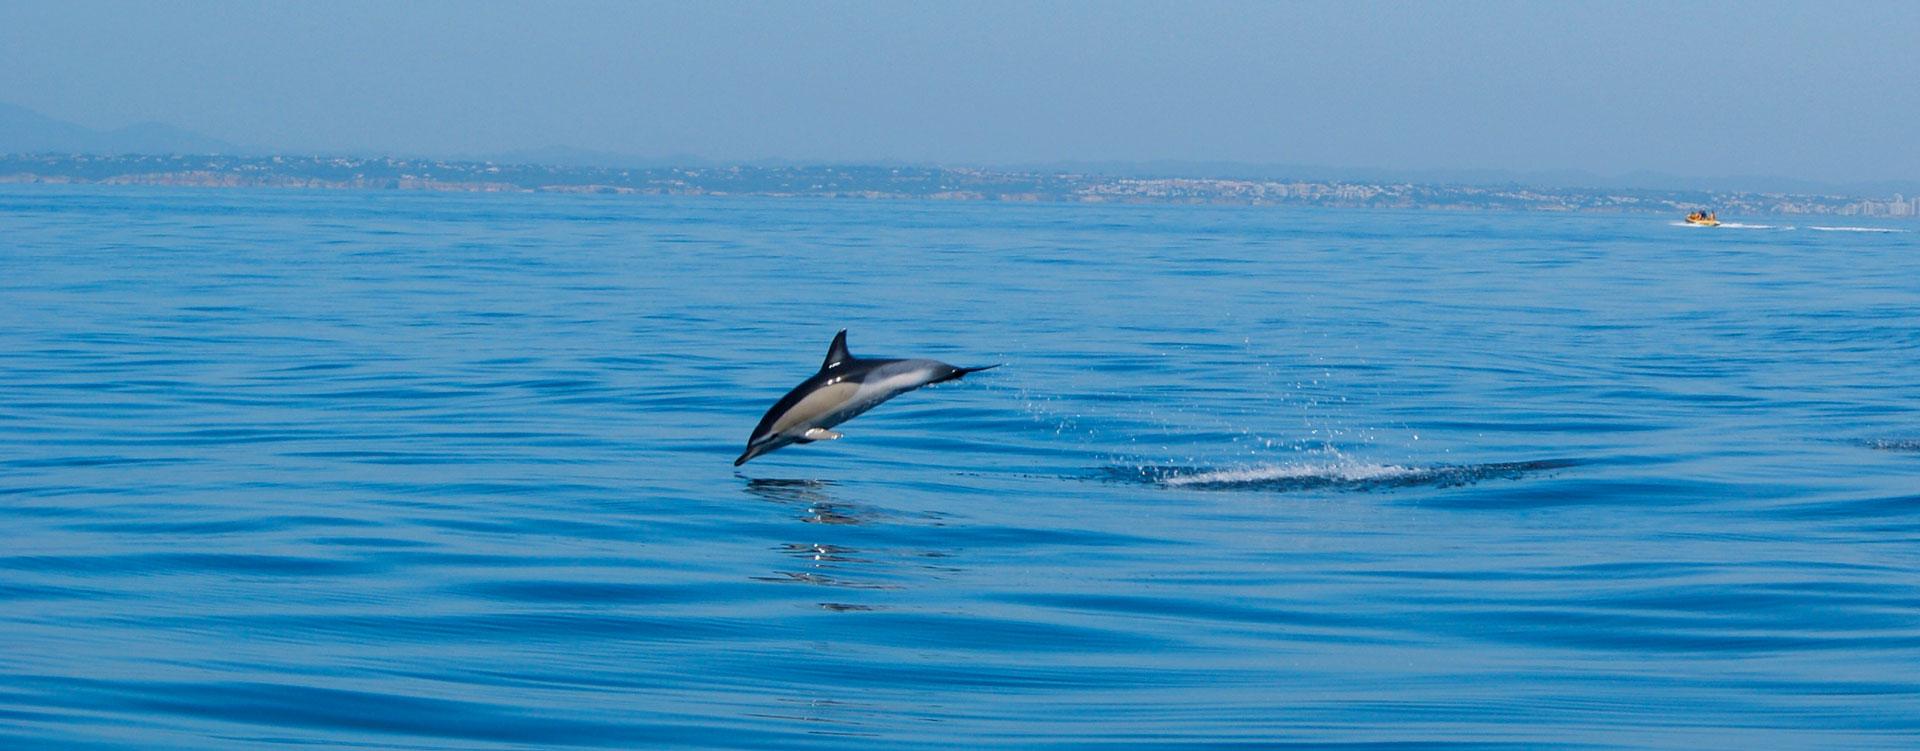 dolphins dolphin water algarve vilamoura